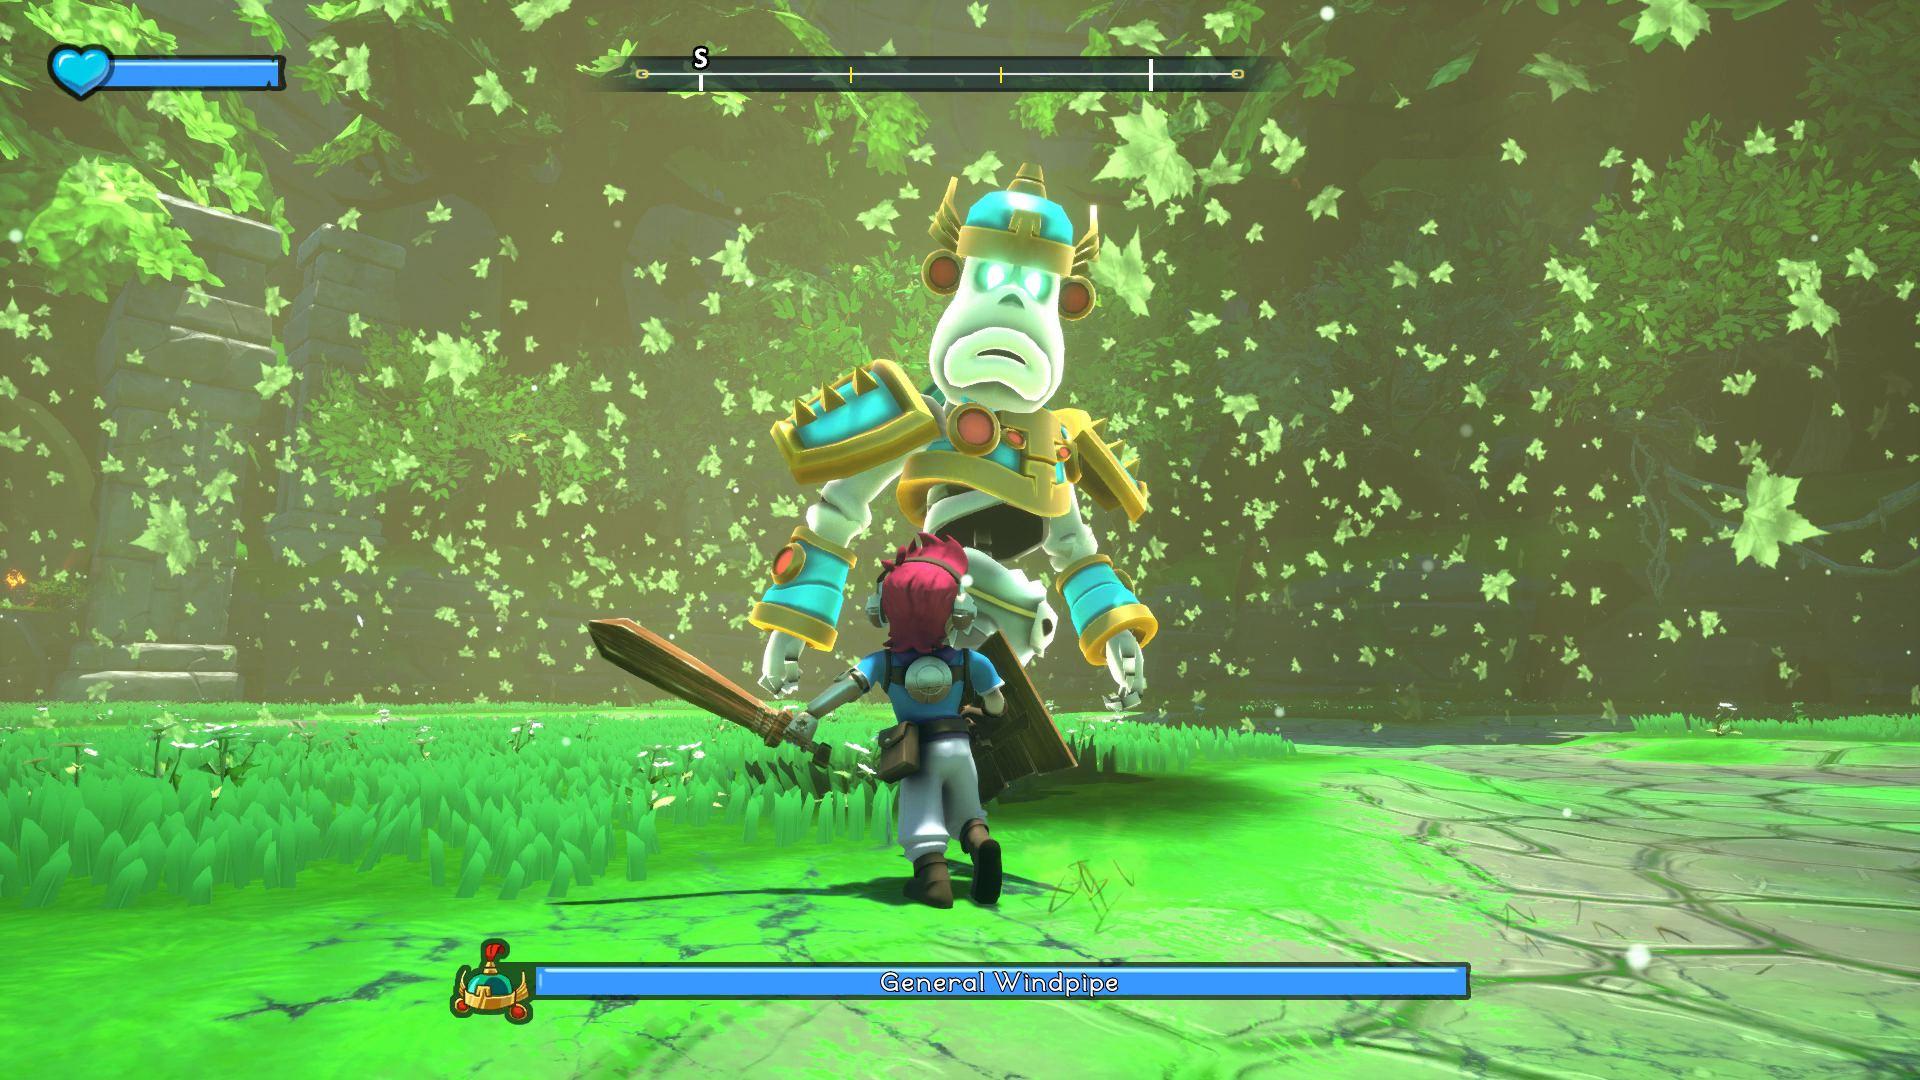 A_Knights_Quest_Screenshot_3